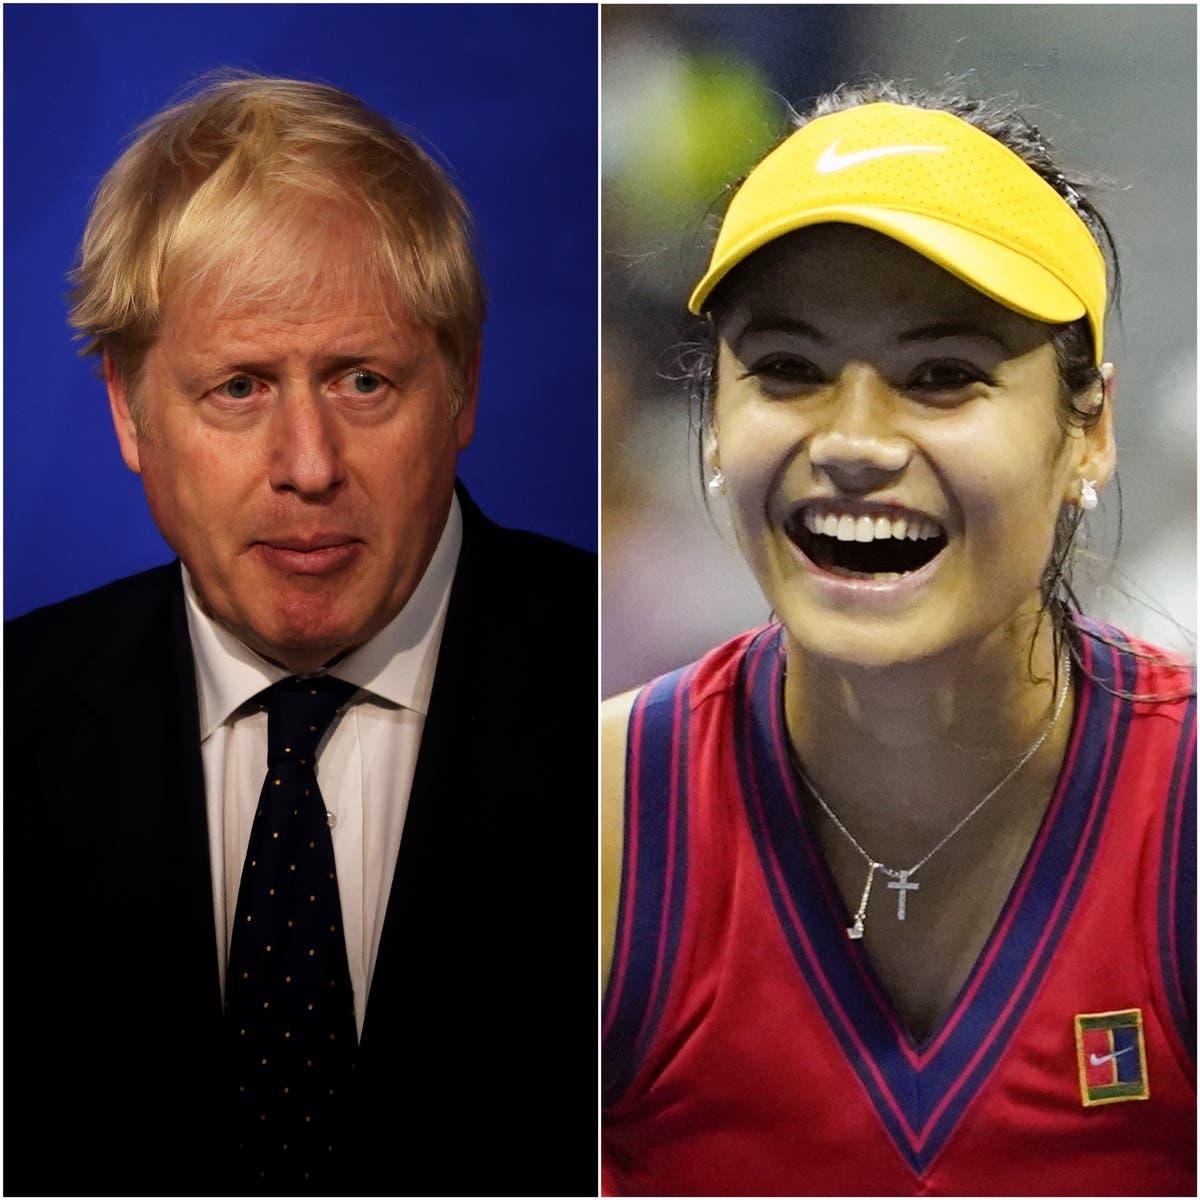 Boris Johnson talks with Emma Raducanu and discusses growth of grassroots tennis